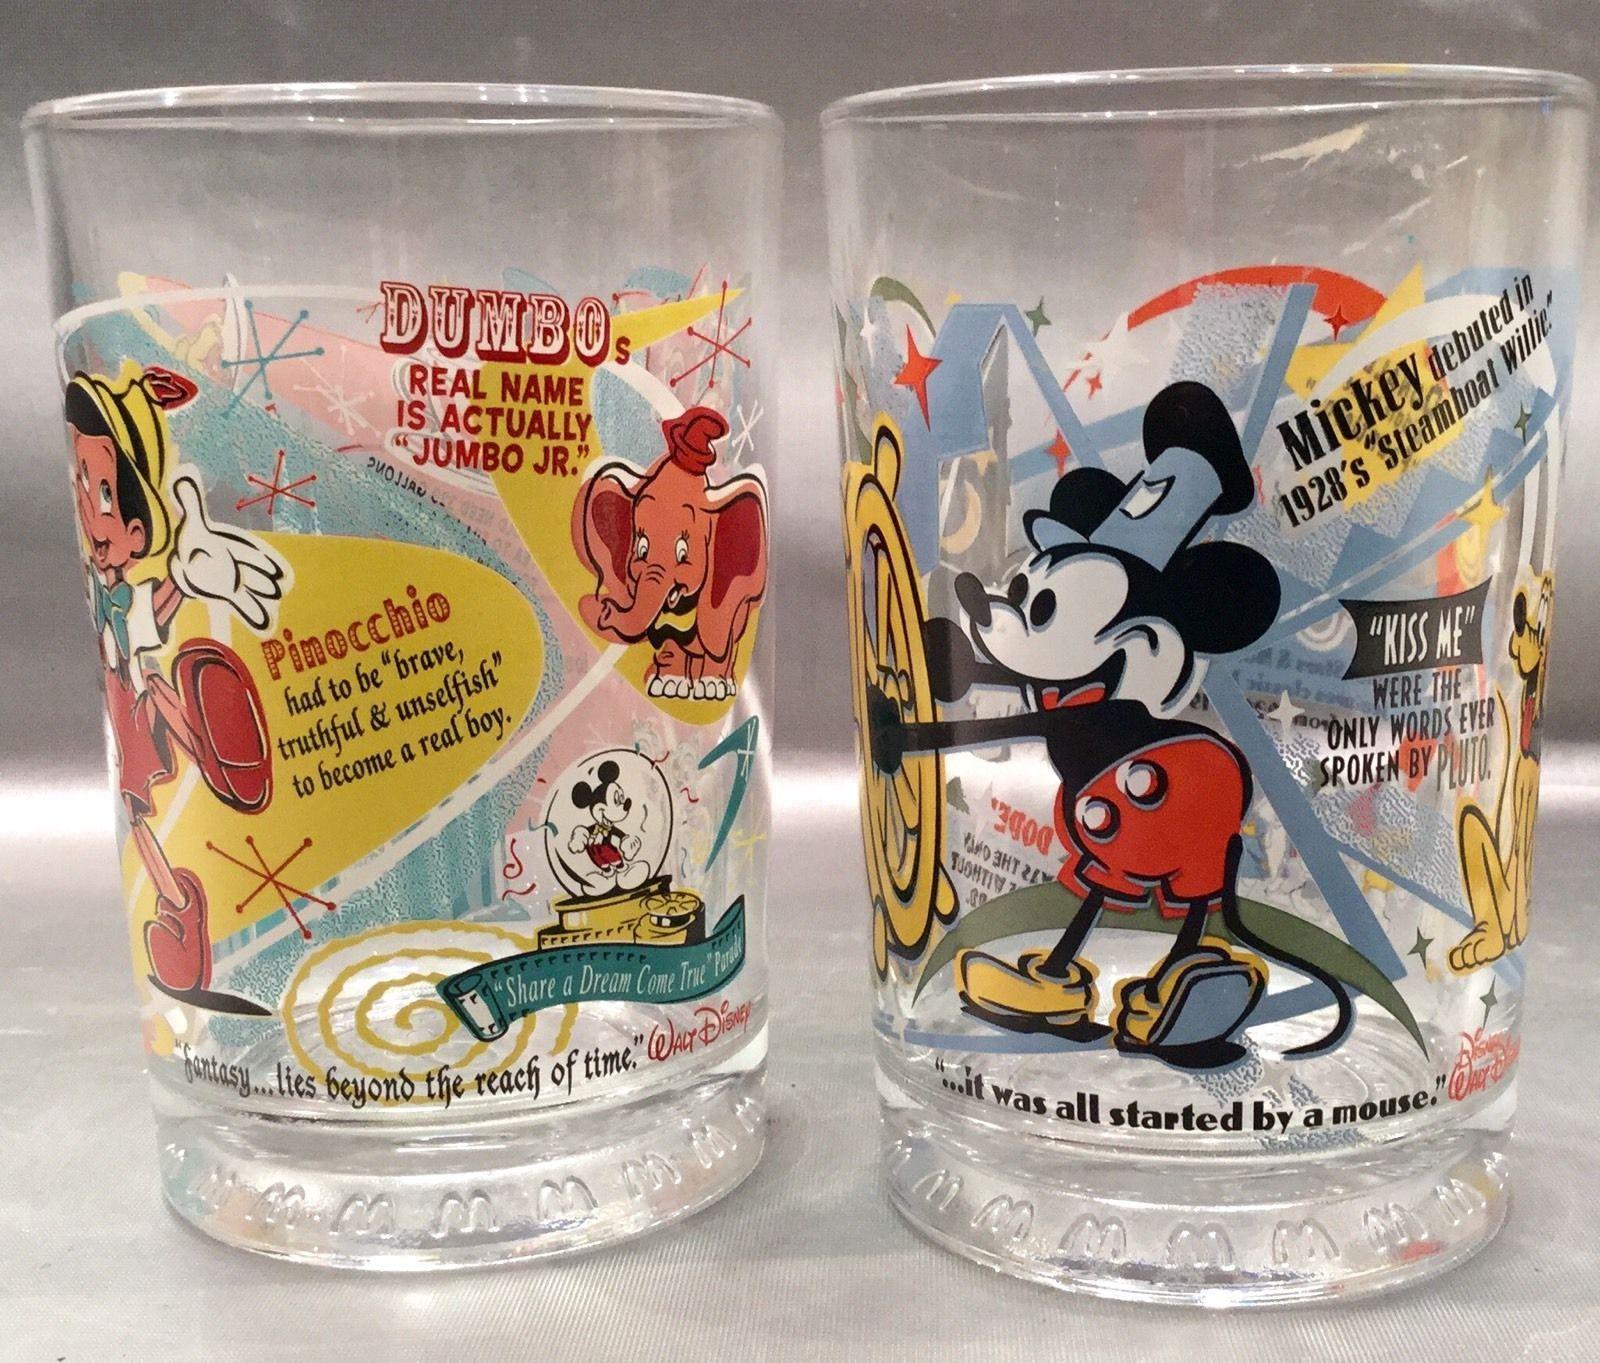 The complete 4 glass set Walt Disney World McDonalds 100 Years of Magic Tumblers